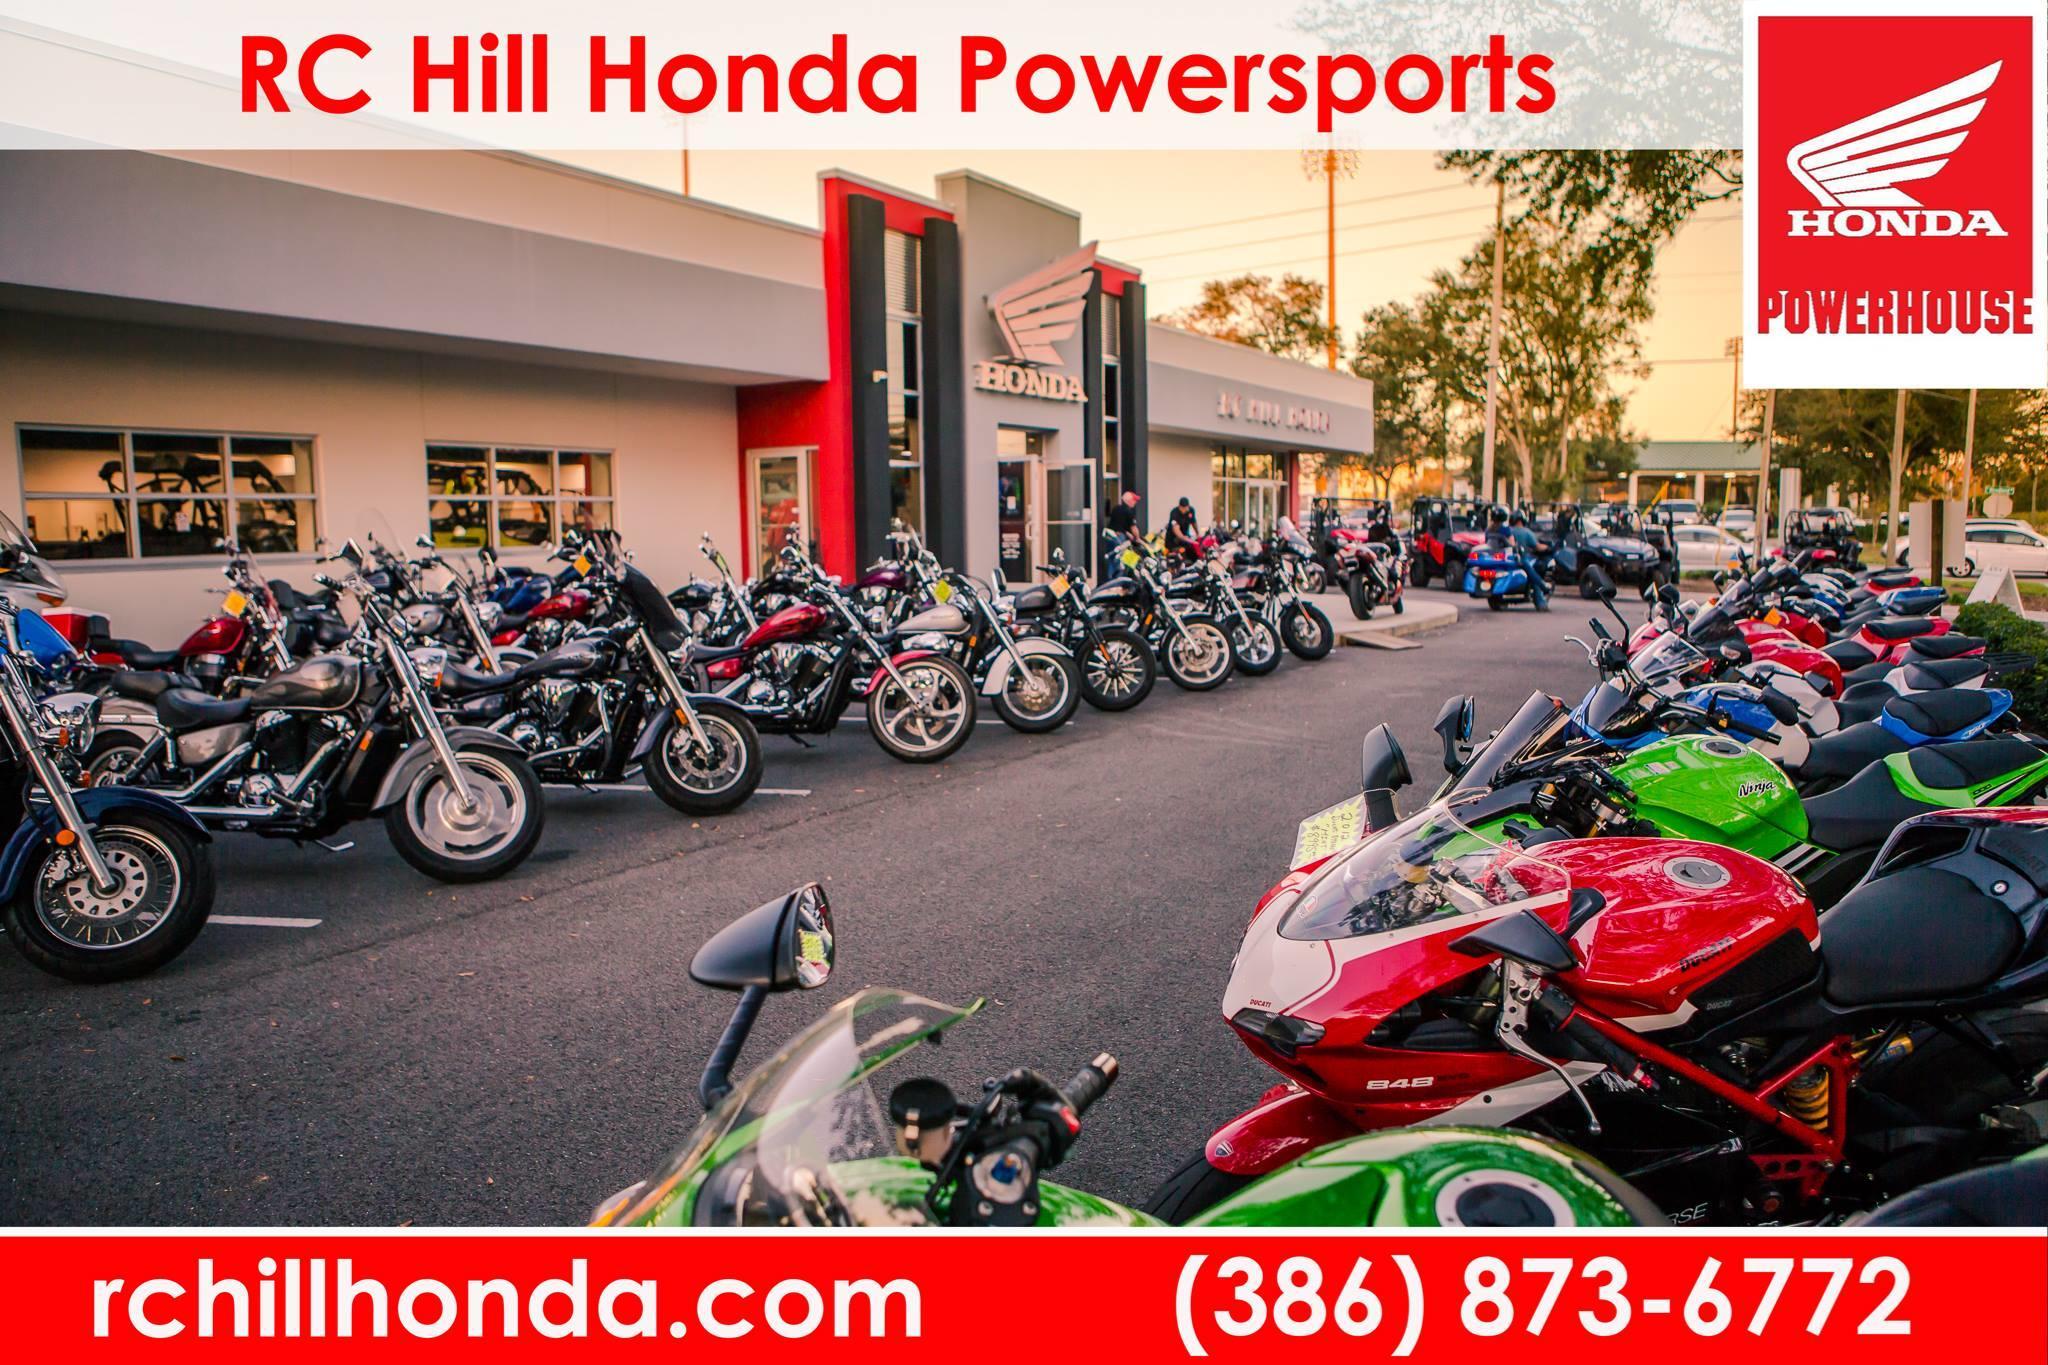 RC Hill Honda Powersports image 0